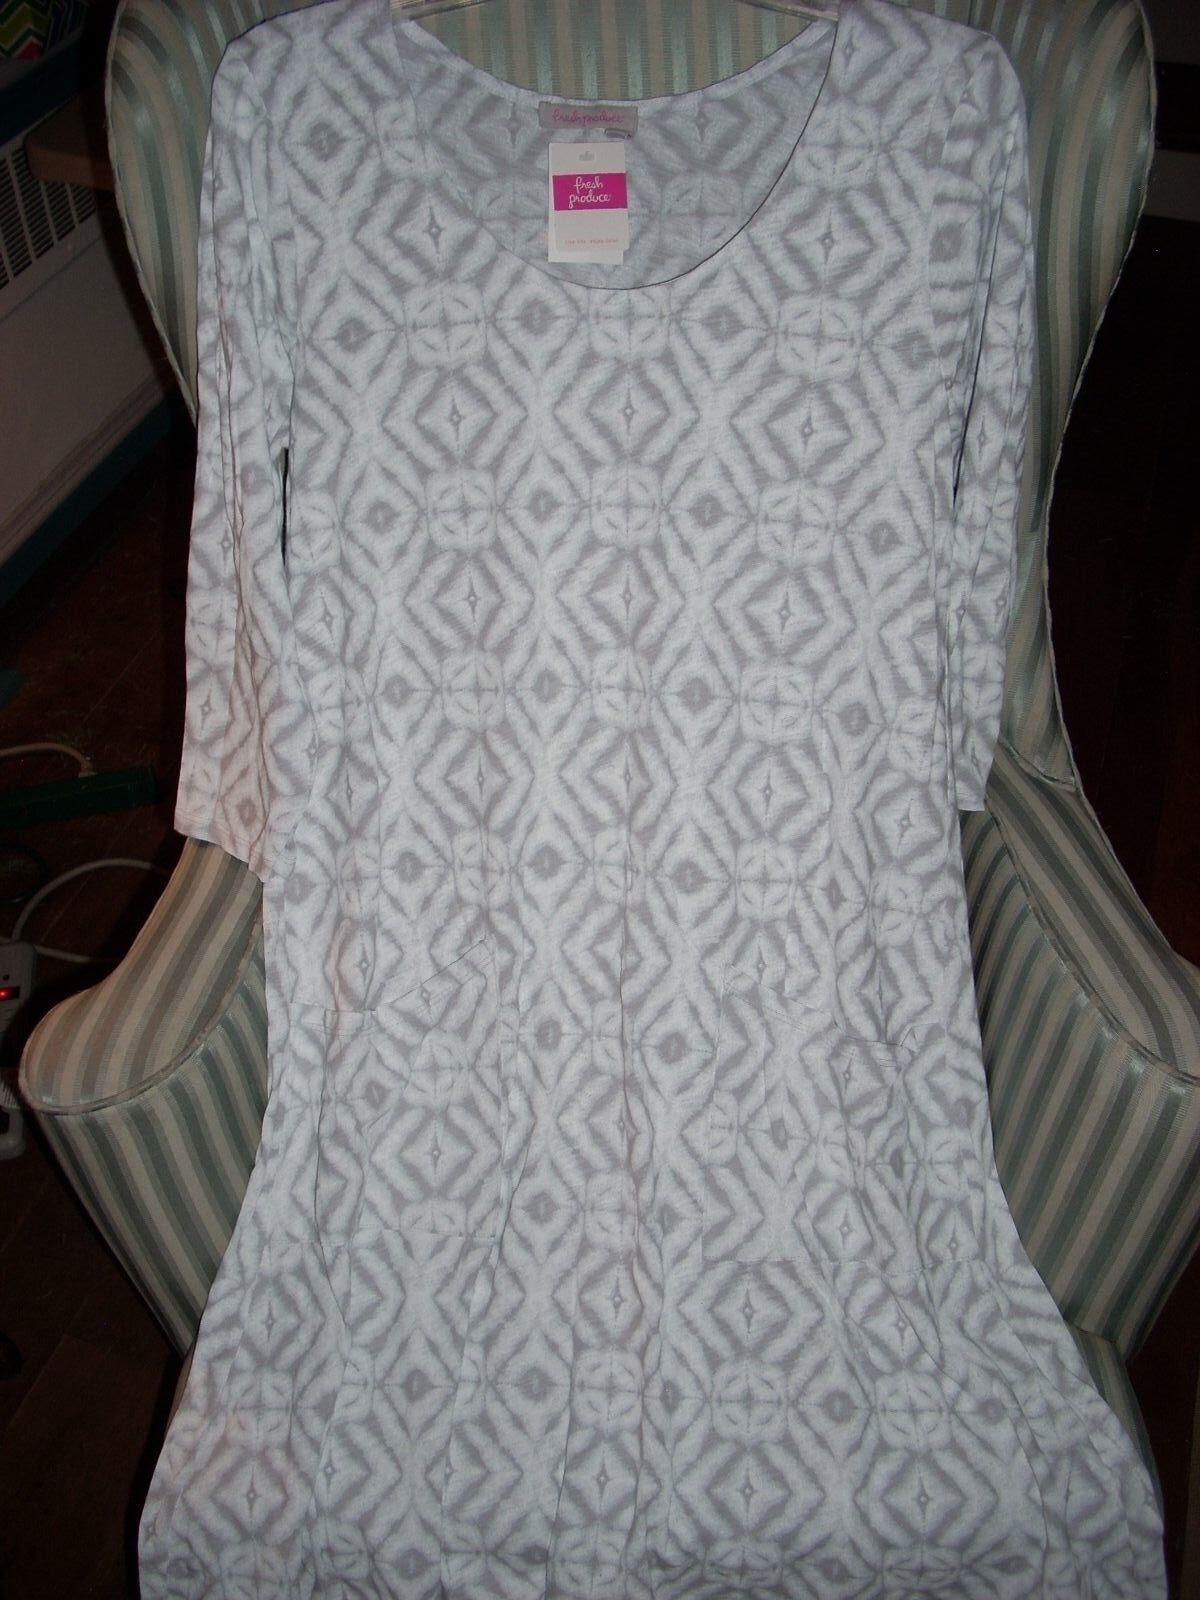 NWT FRESH PRODUCE100% COTTON  SHIBORI  DESIGN  DALIA DRESS ON VAPOR. (M)